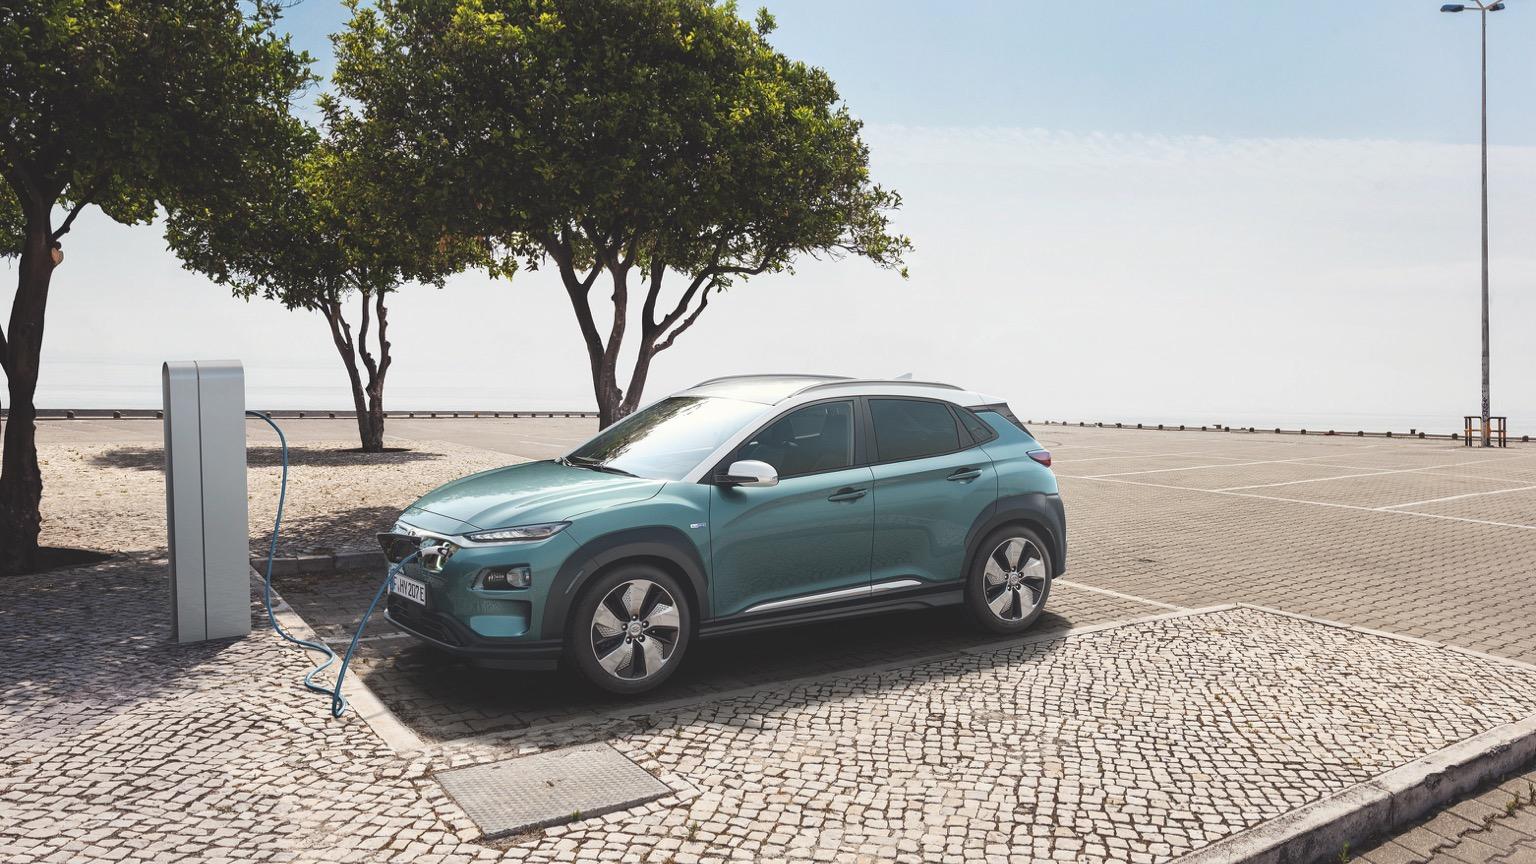 Hyundai Kona Electric 64 kWh (2018)